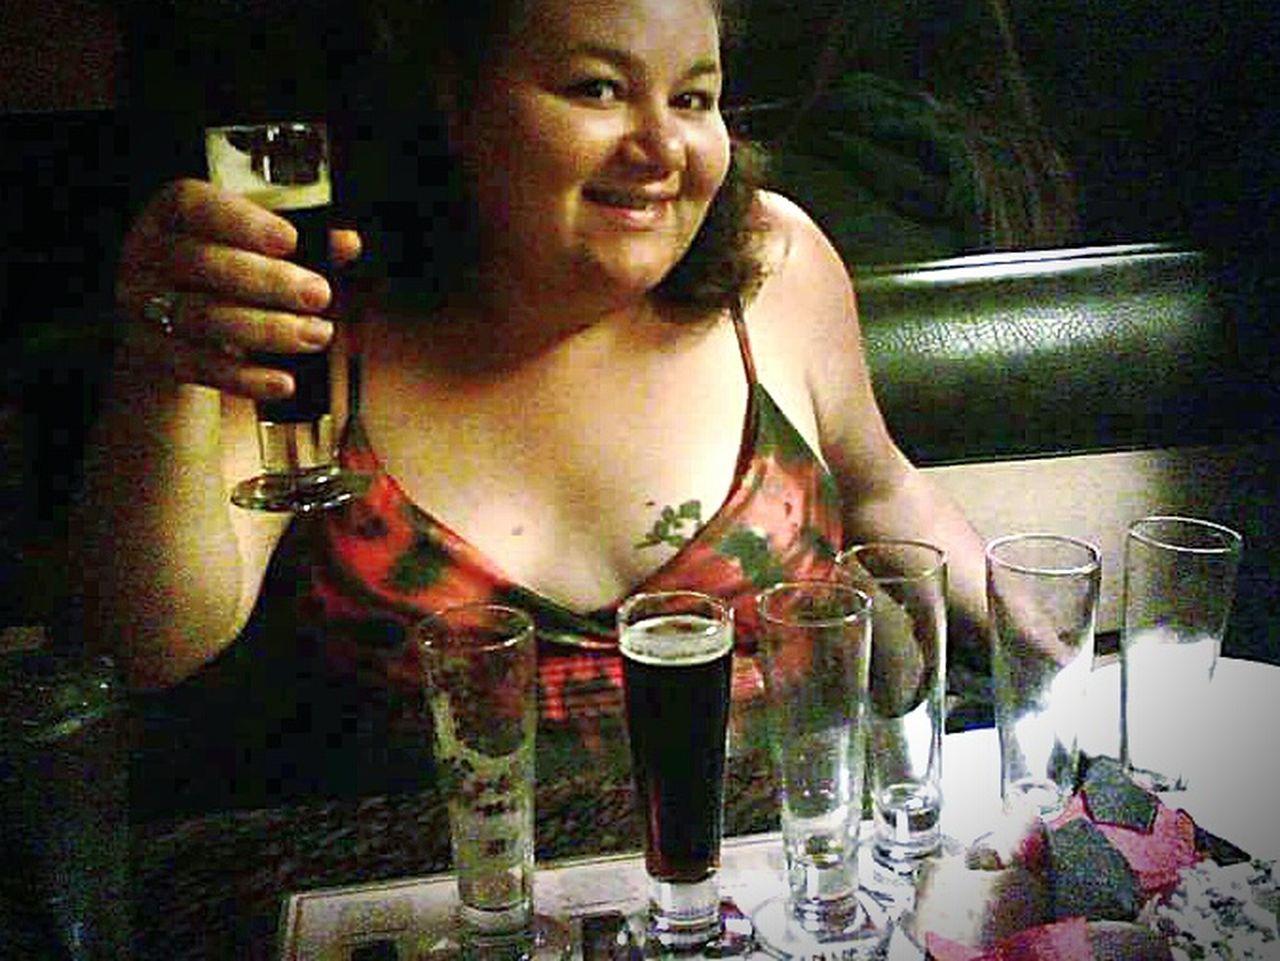 Beer Time Liquid Lunch Beer Flights BJ's Brewery Thats Me ♥